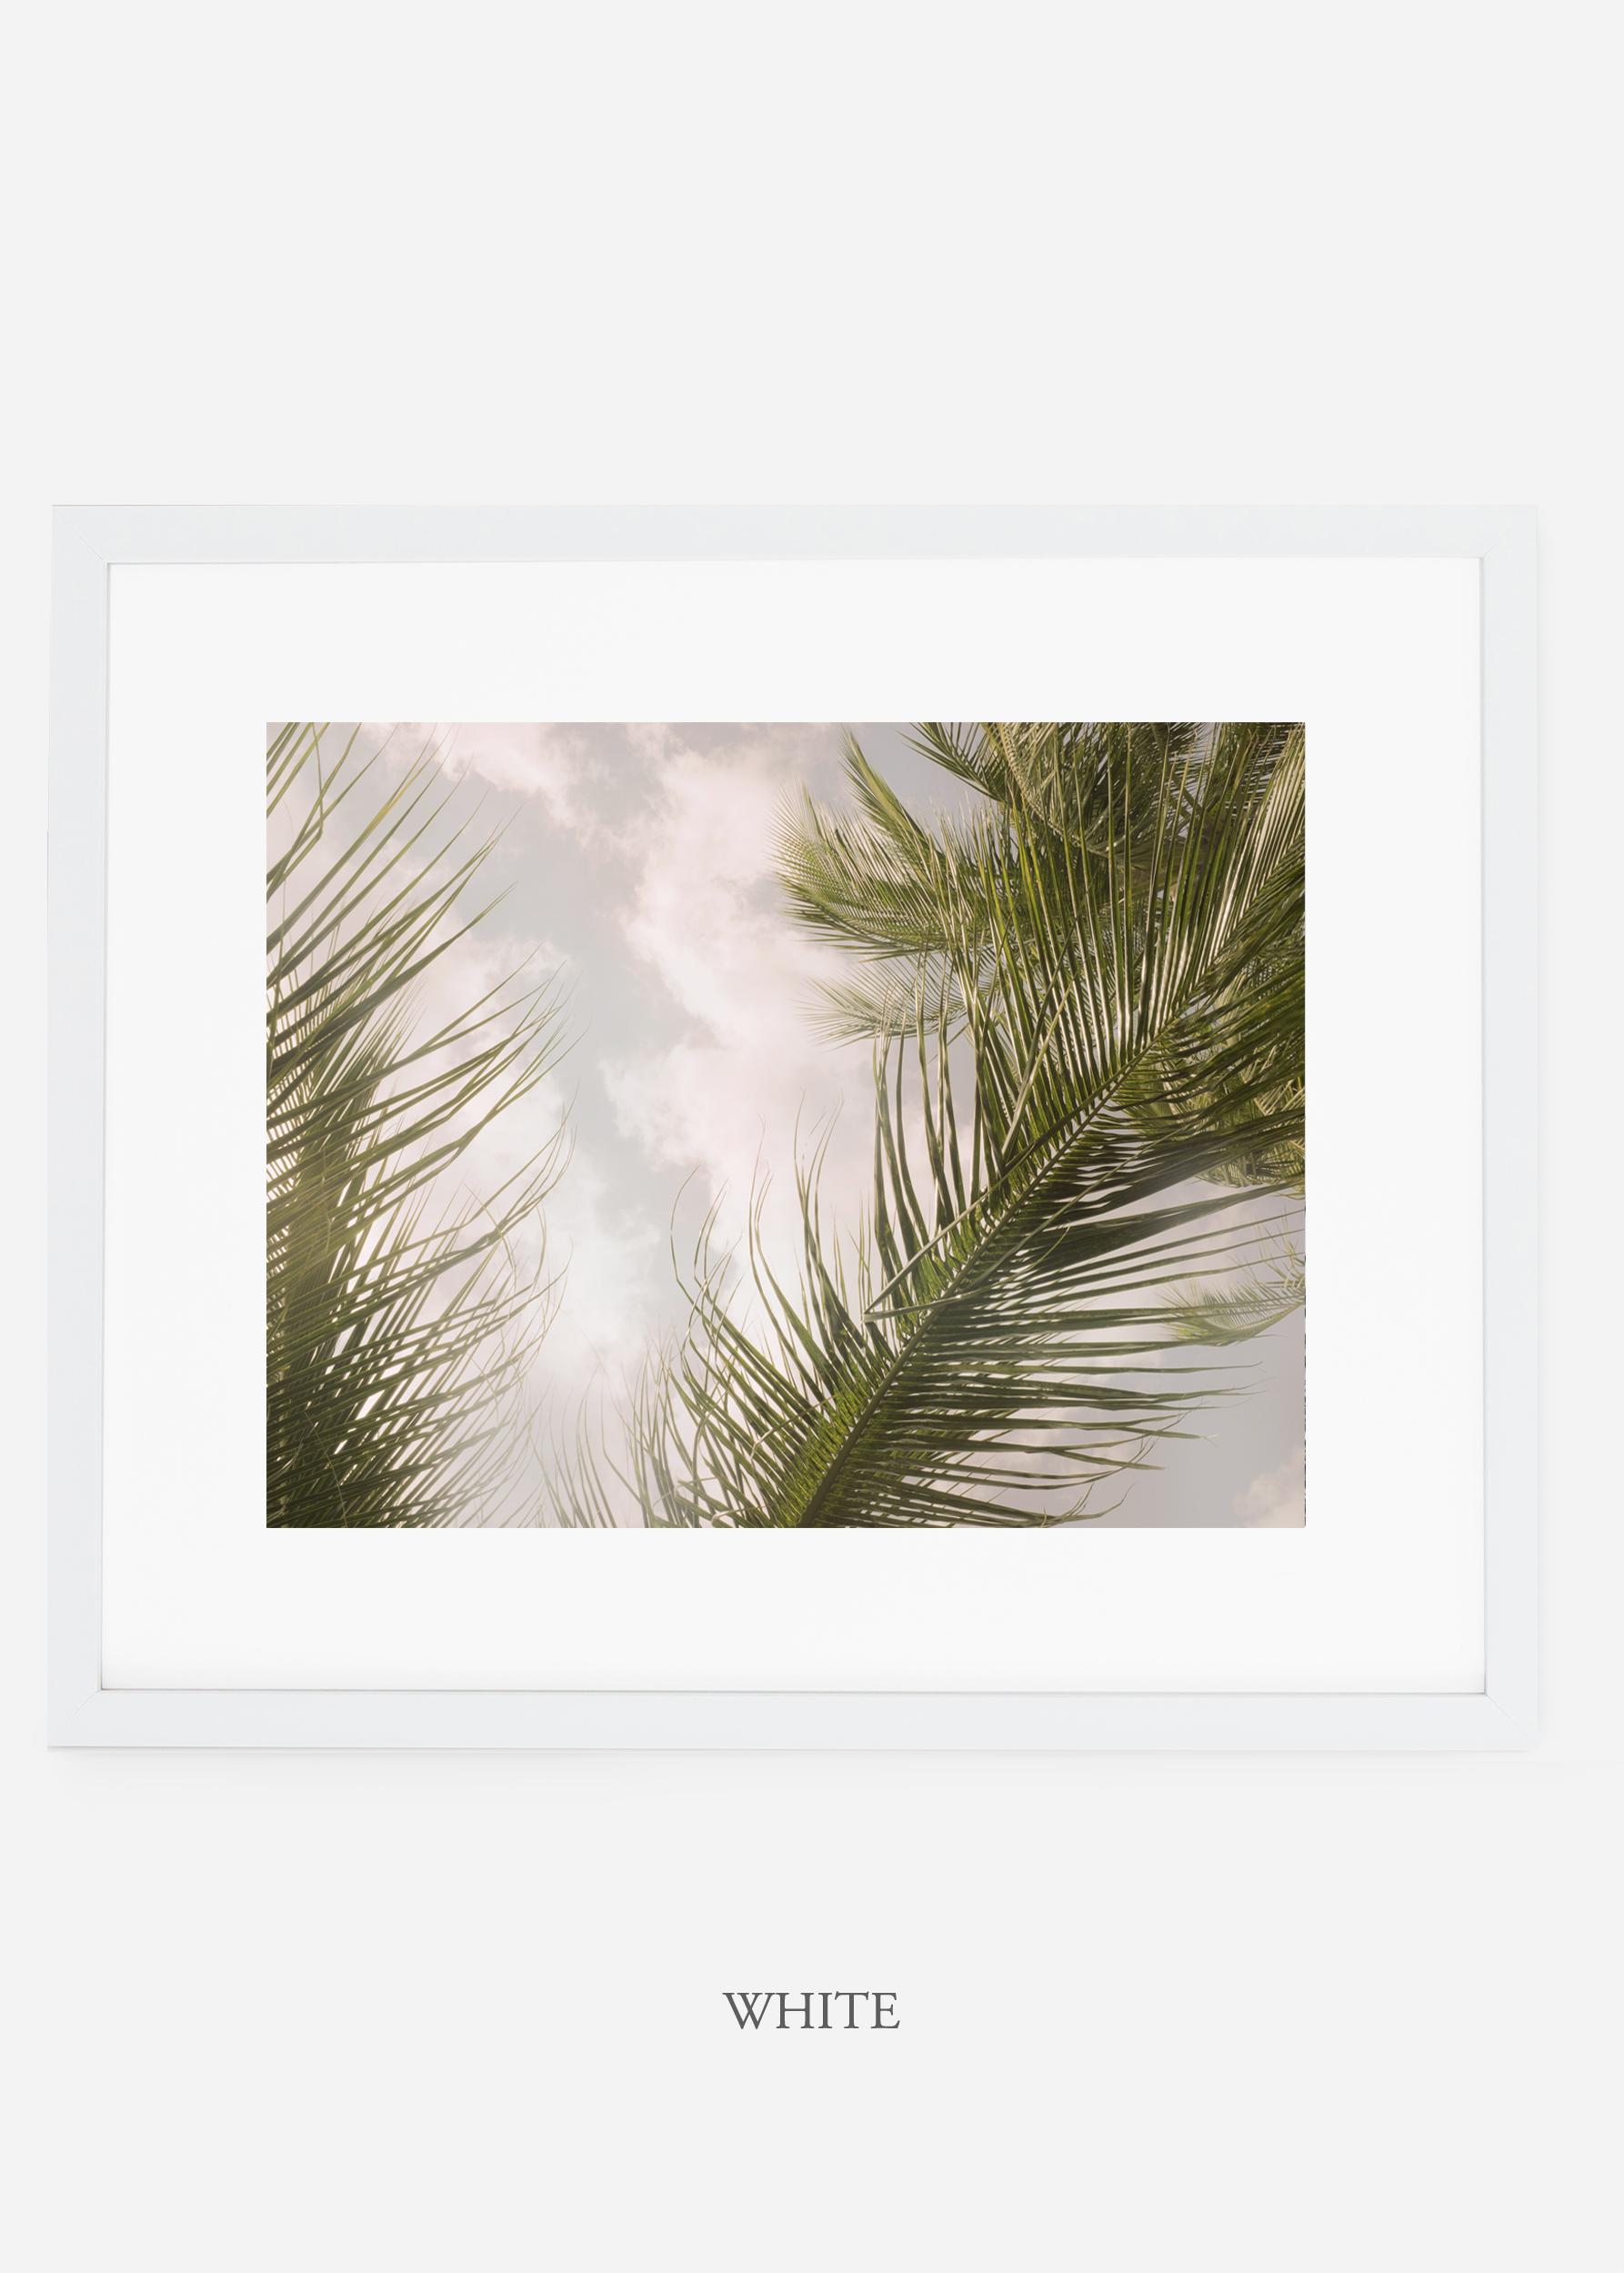 interiordesign_whiteframe_AiryPalmTreeNo.1_art_tropical_palmtree_StormyGrayPalm.jpg